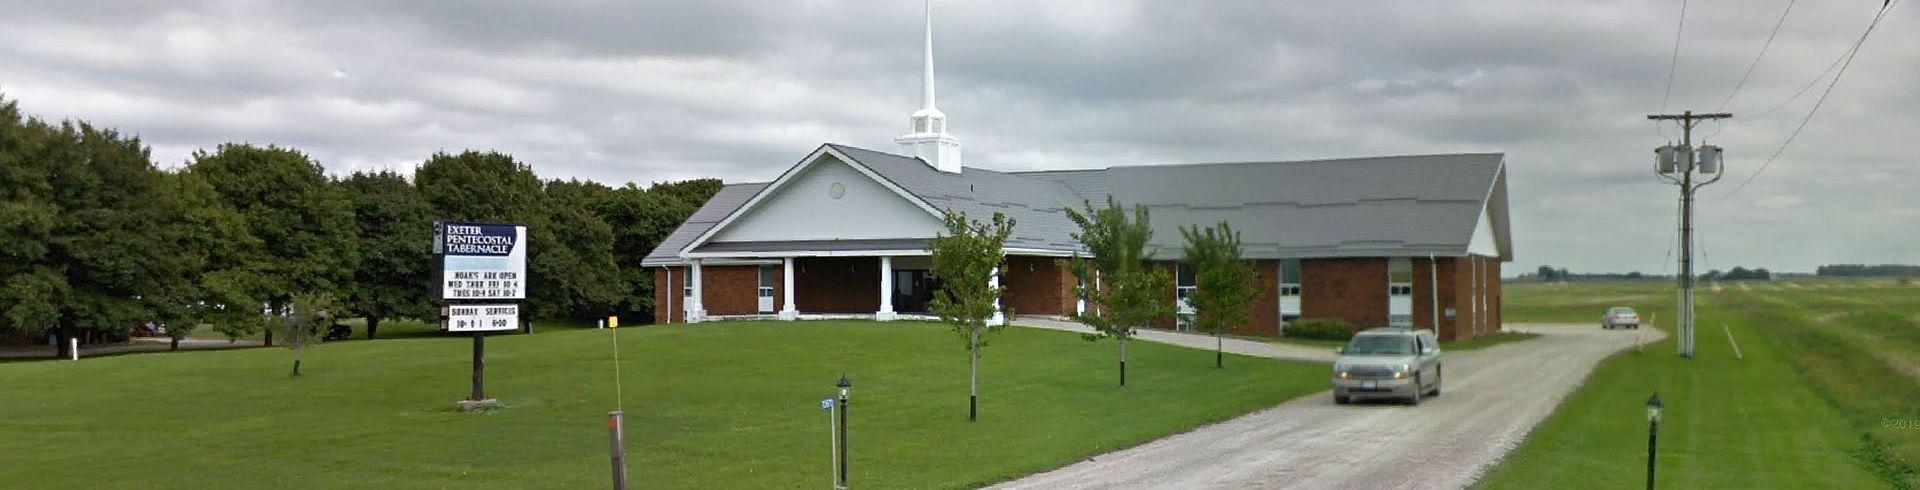 Exeter Pentecostal Tabernacle